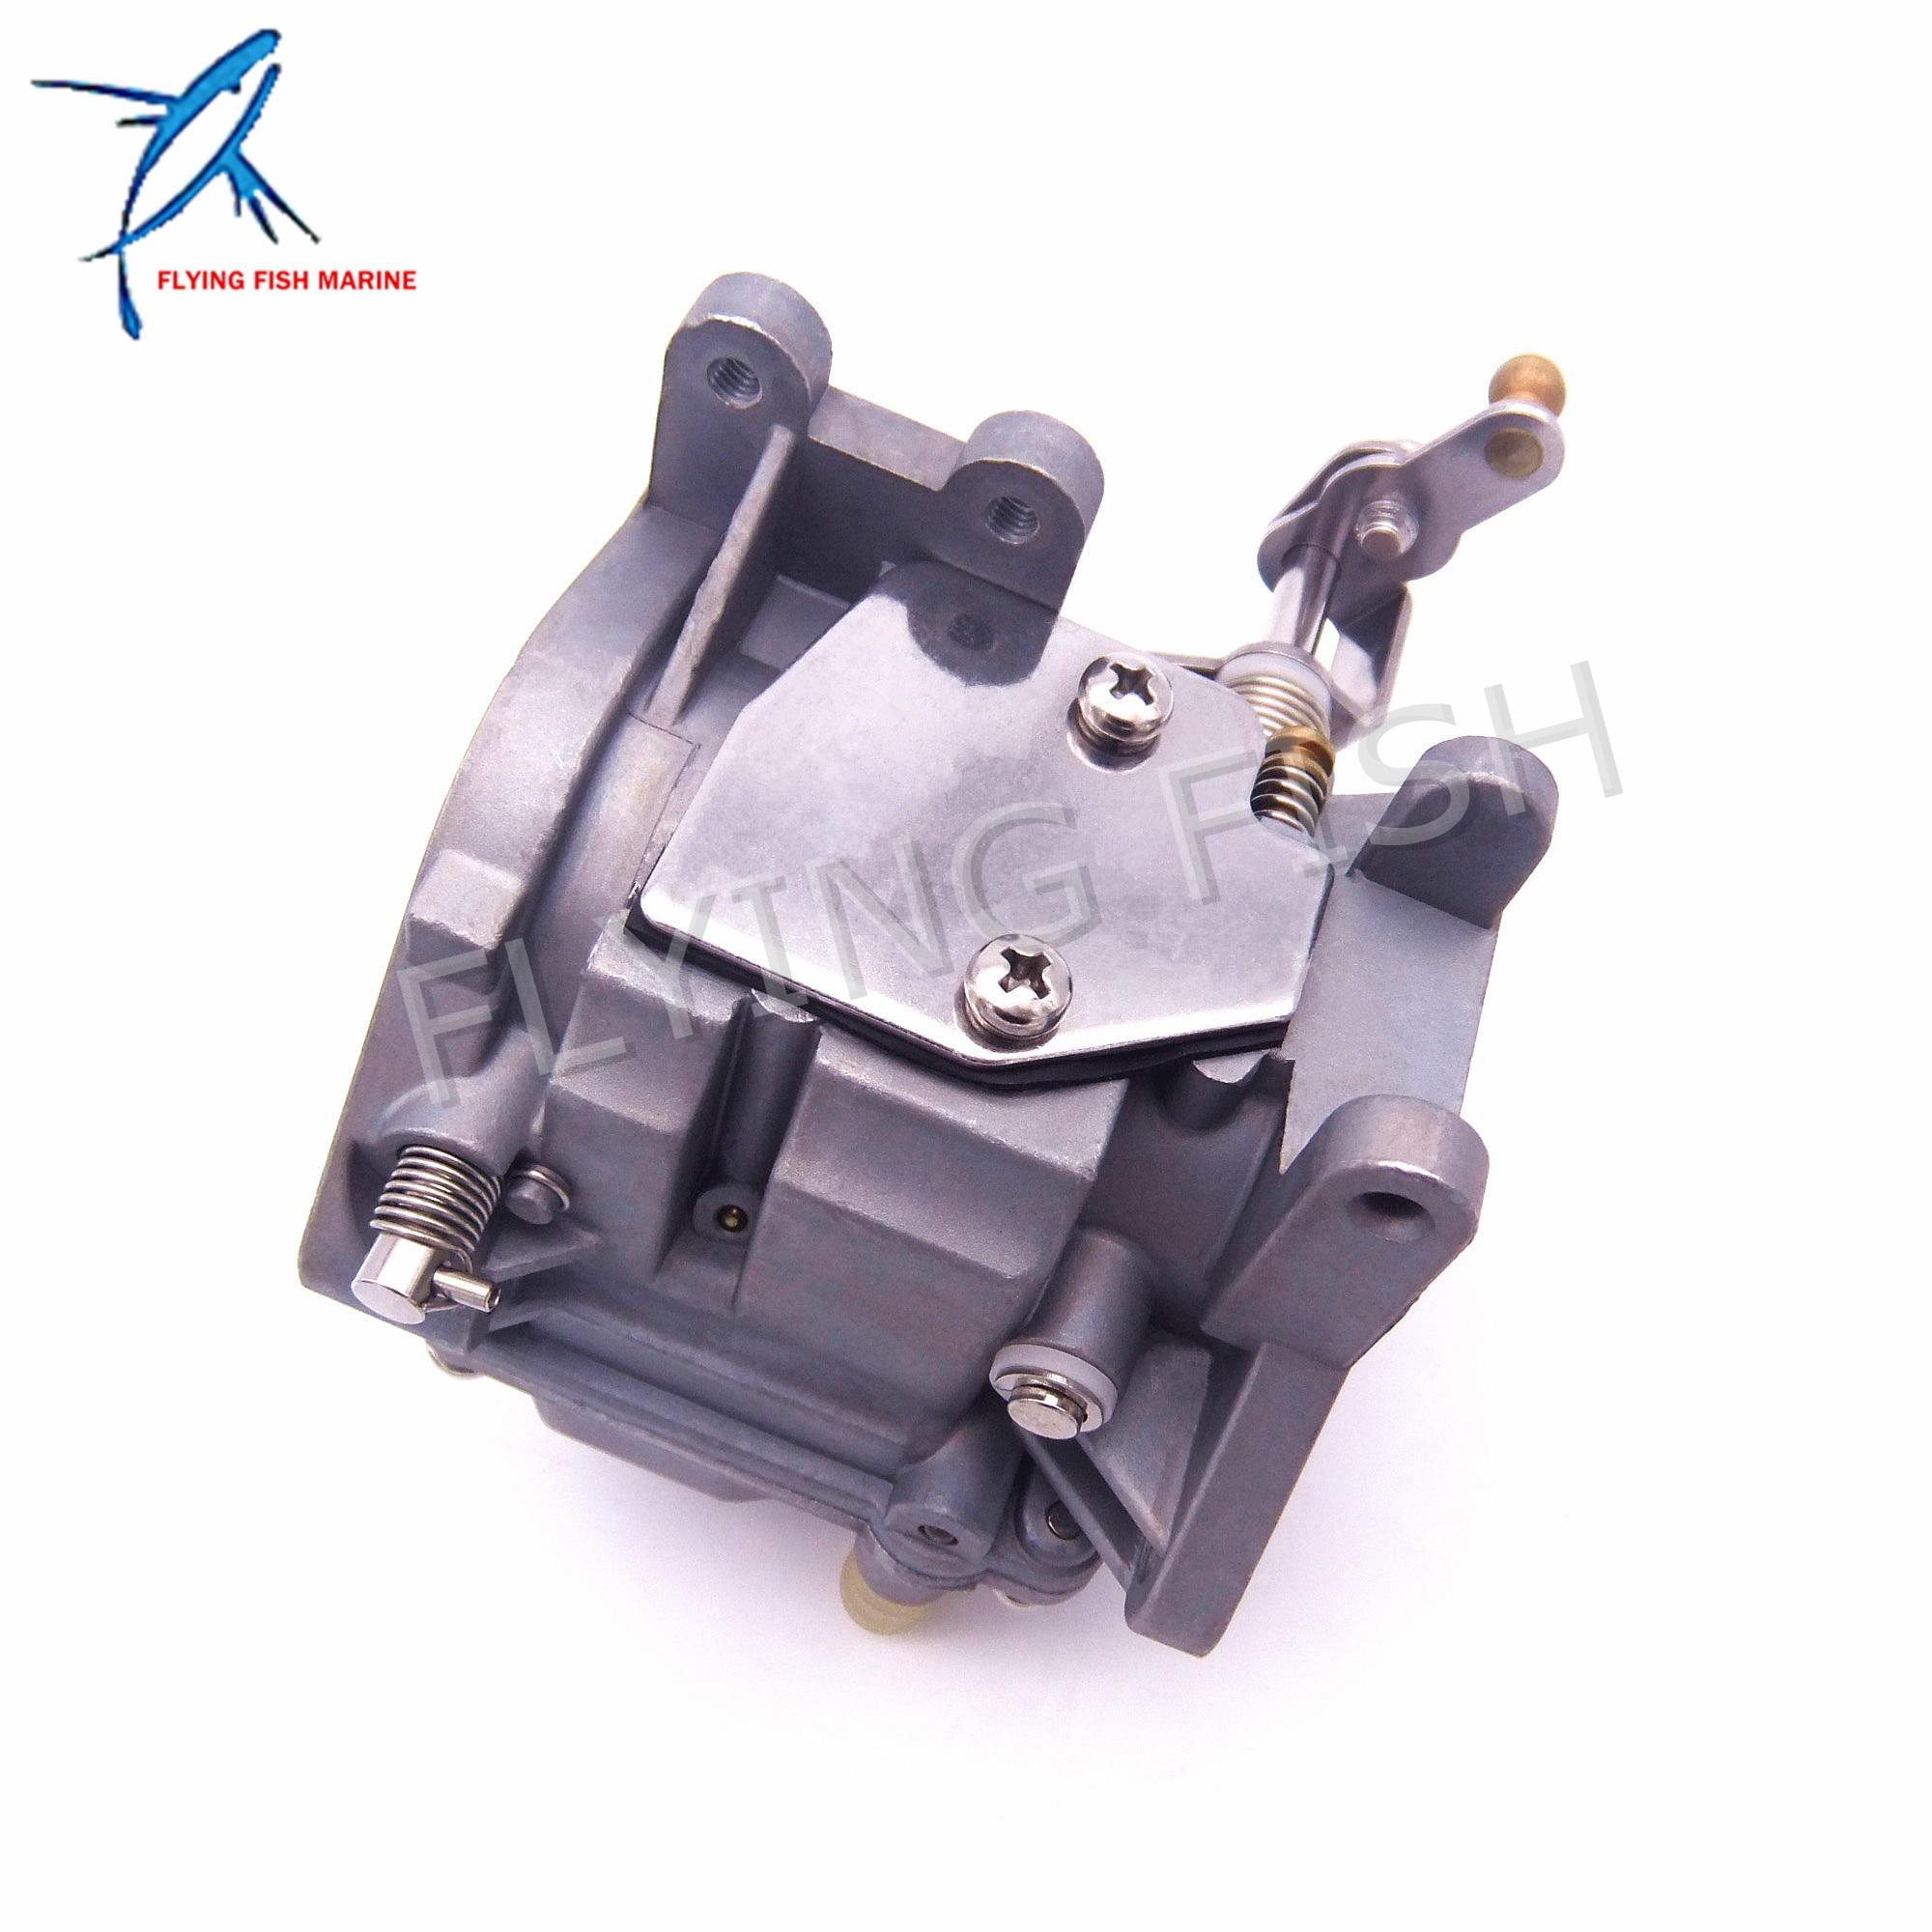 Boat Motor Carburetor Assy 69P-14301-00  69S-14301-00  61N-14301 For Yahama 2-stroke E25B E30H  25B 30H